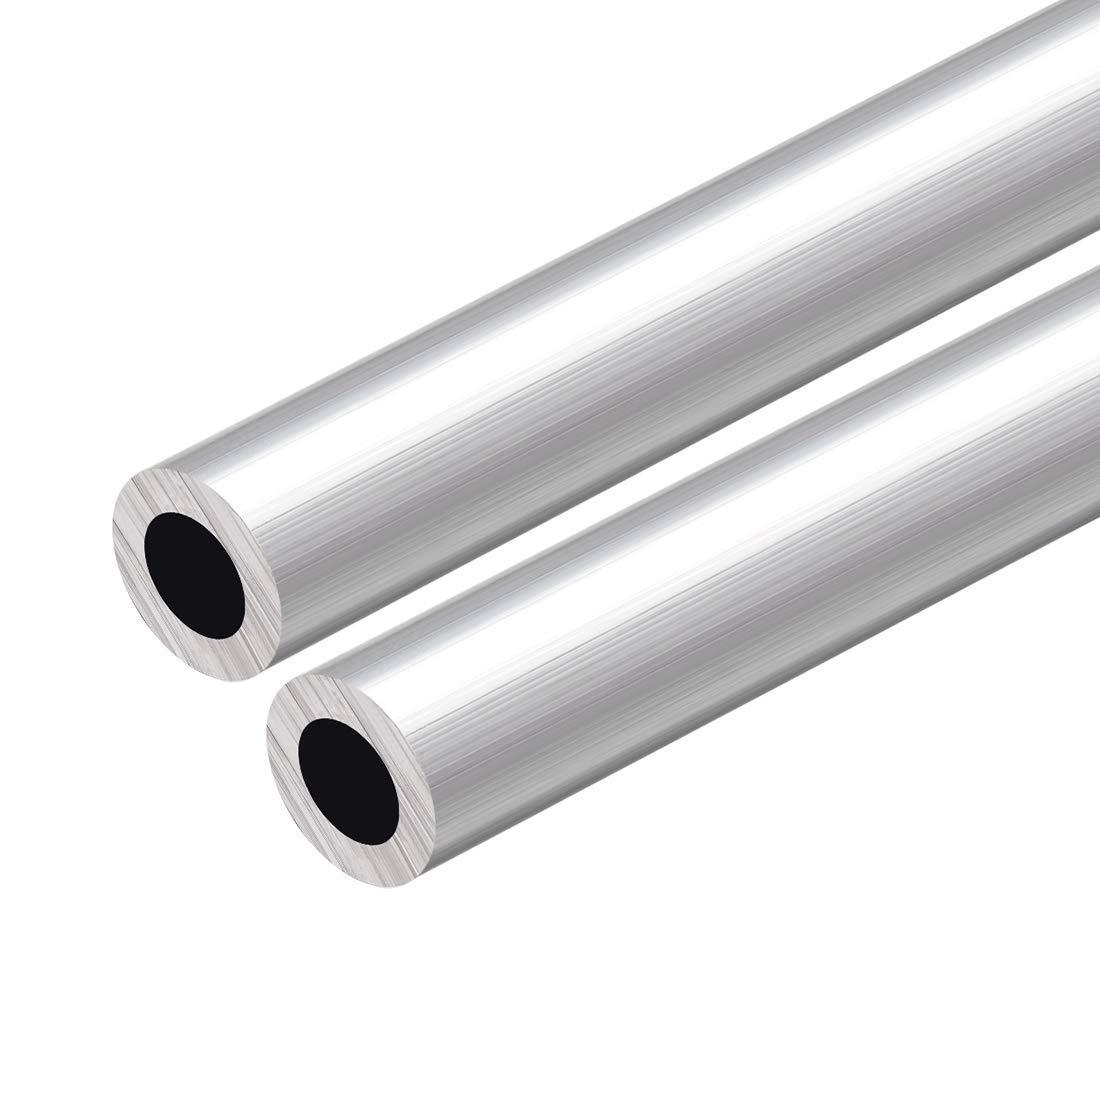 6063 Round Aluminum Tube 300 mm Length 20 mm OD 10 mm Inside Diameter Seamless Straight Aluminum Tube 2 Pieces